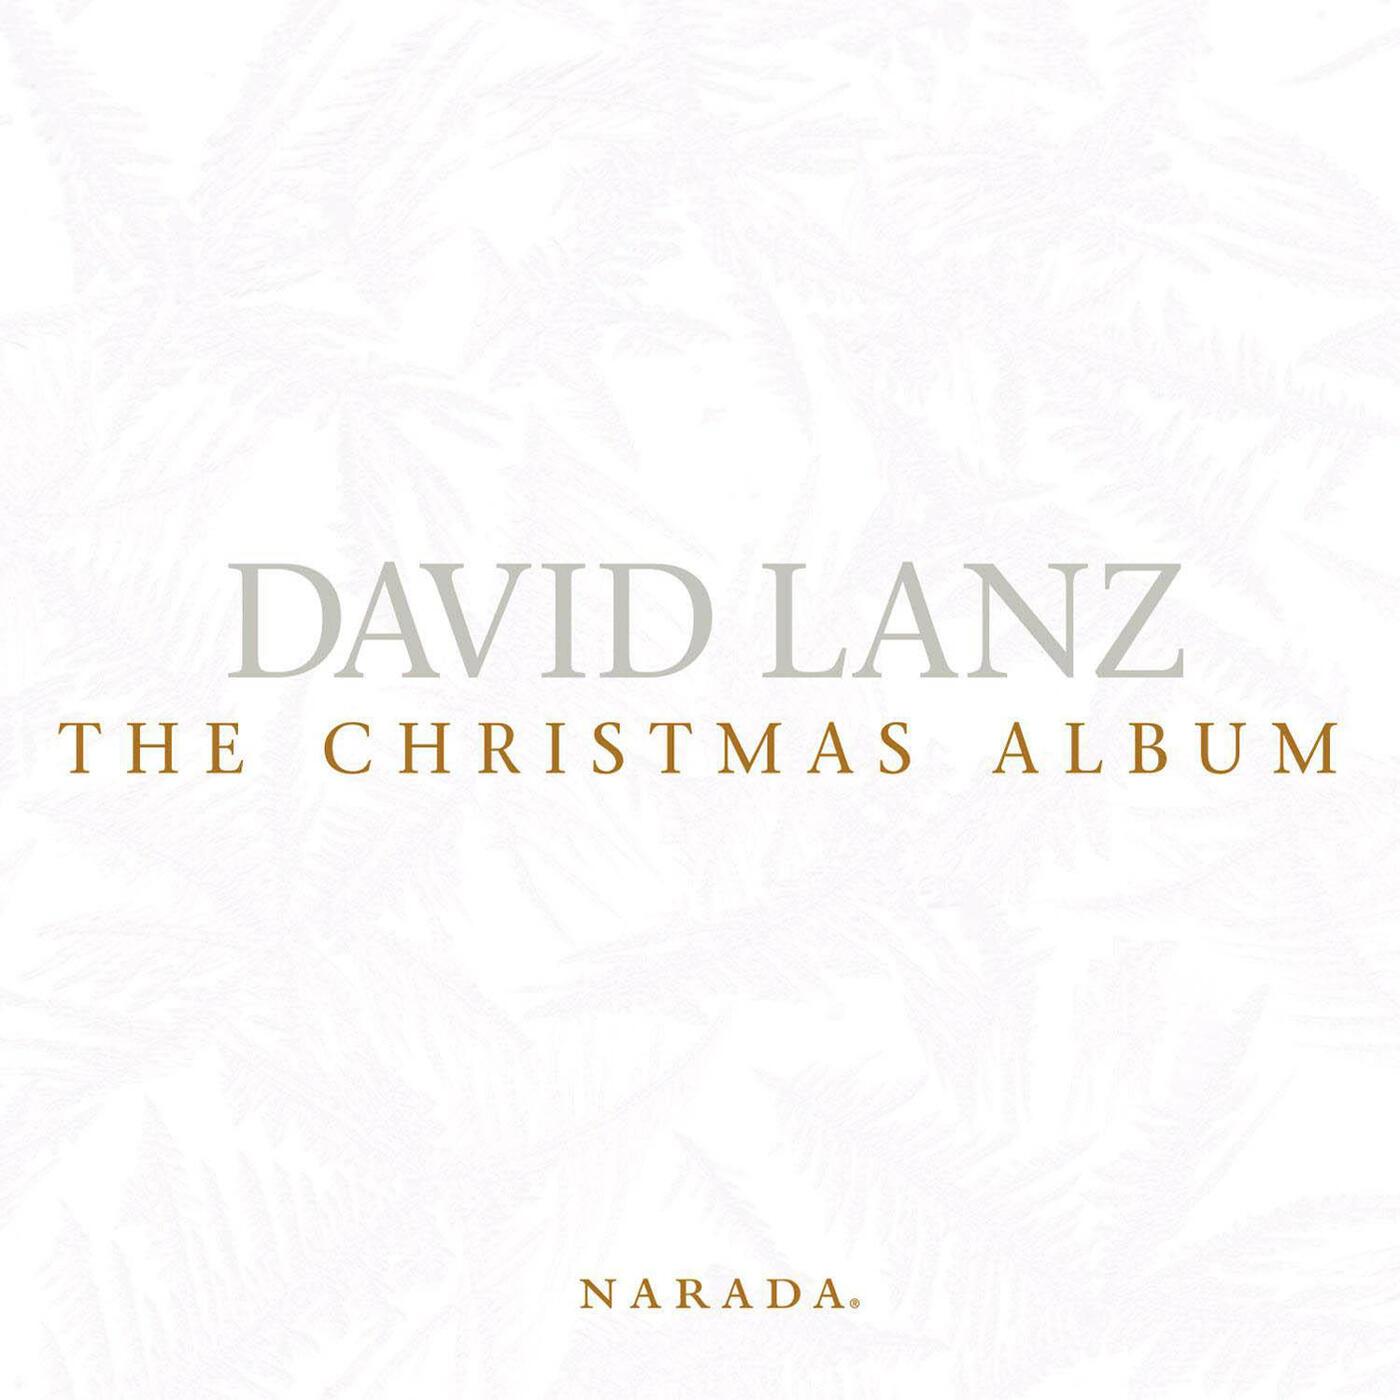 Listen Free to David Lanz - The Christmas Album Radio on iHeartRadio ...